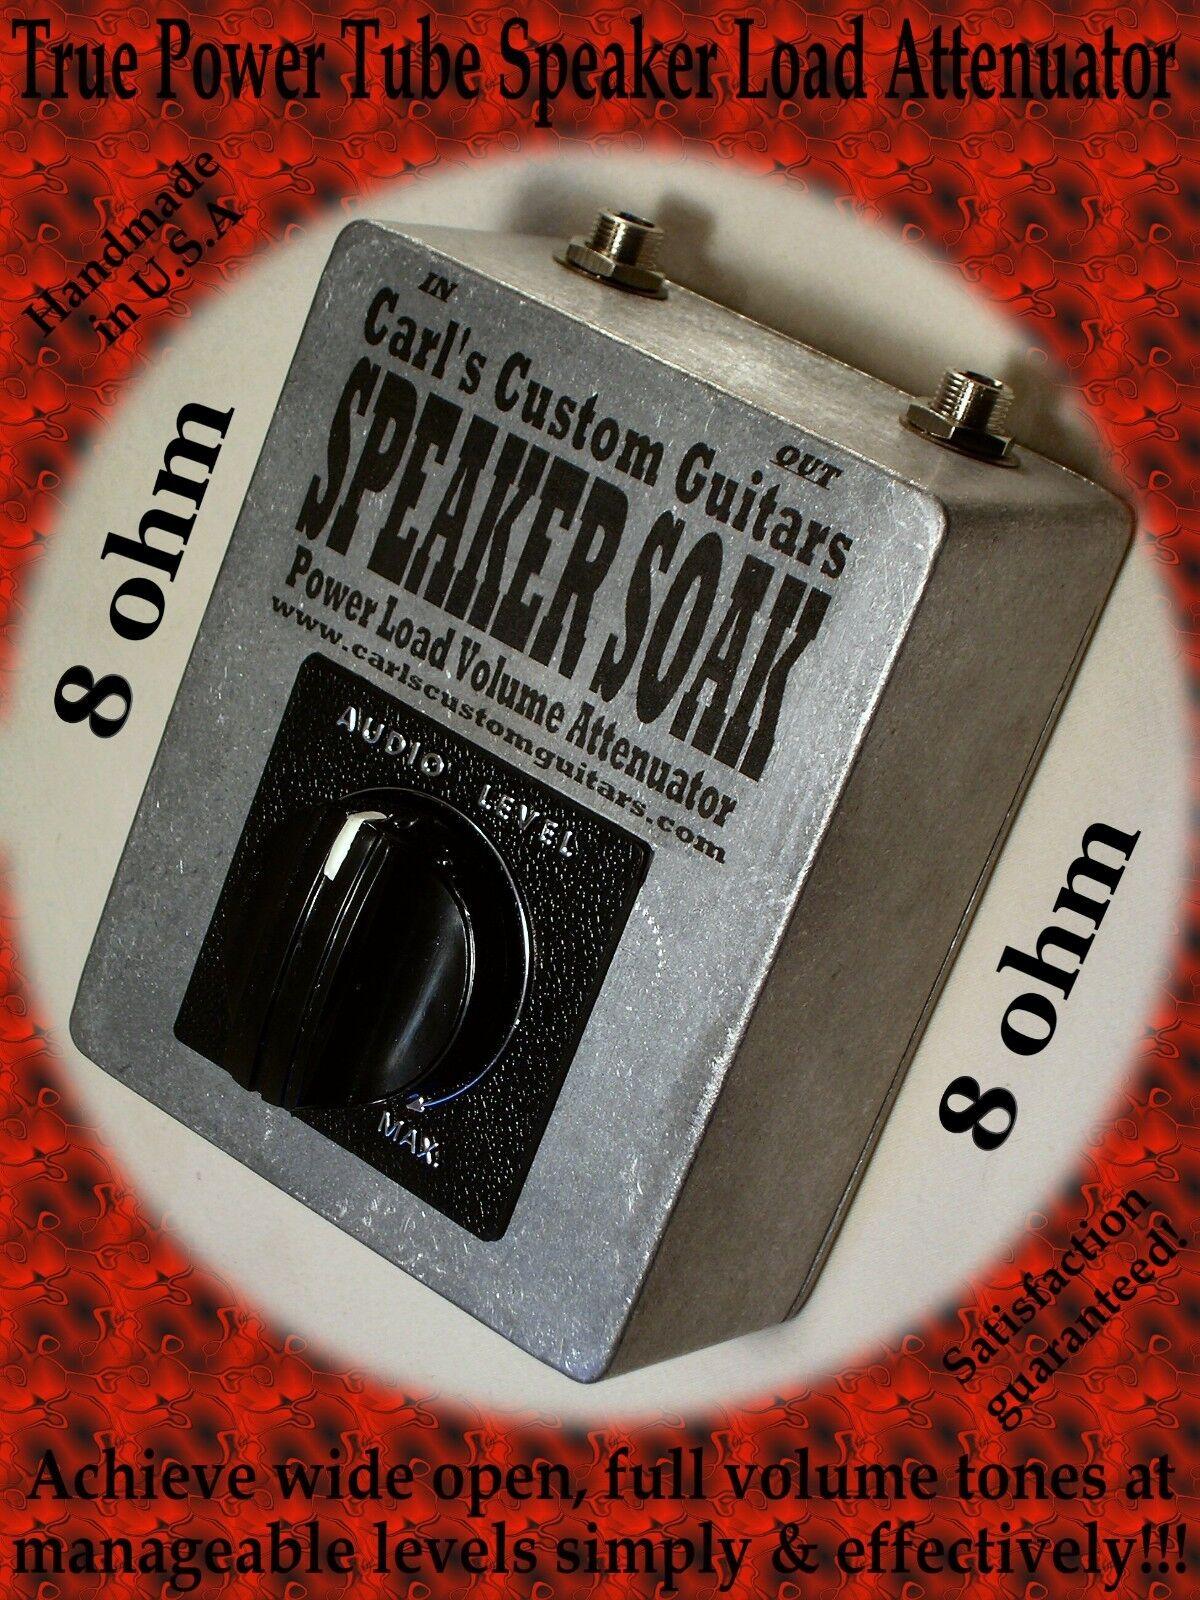 8 Ohm hasta 60w Altavoz Altavoz Altavoz Soak Guitarra Power Tube Freno   Carga   Mass Atenuador 53a81d